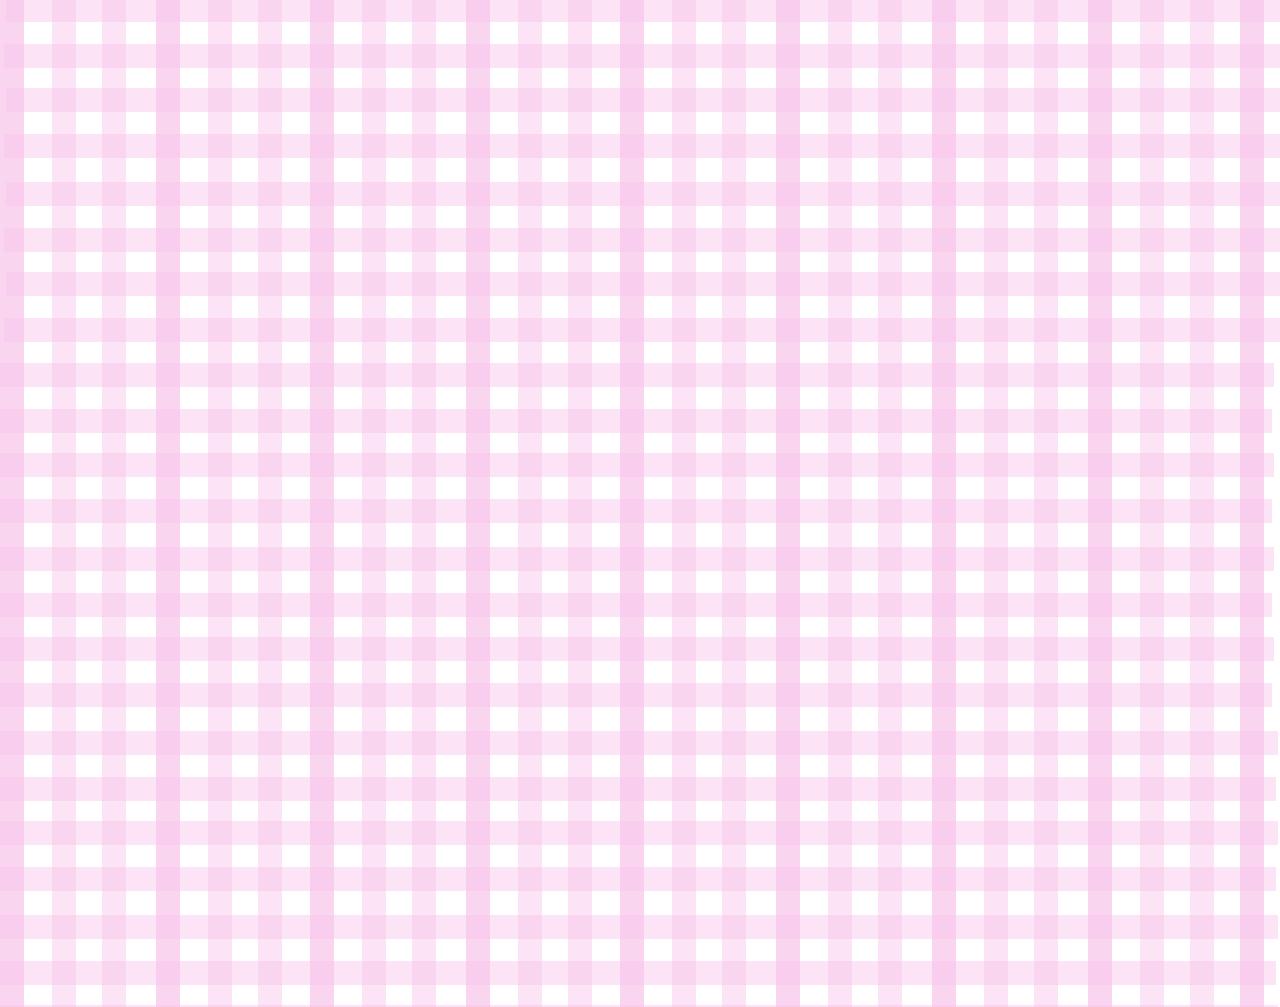 Baby Pink Wallpaper - WallpaperSafari Pink Baby Background Wallpaper